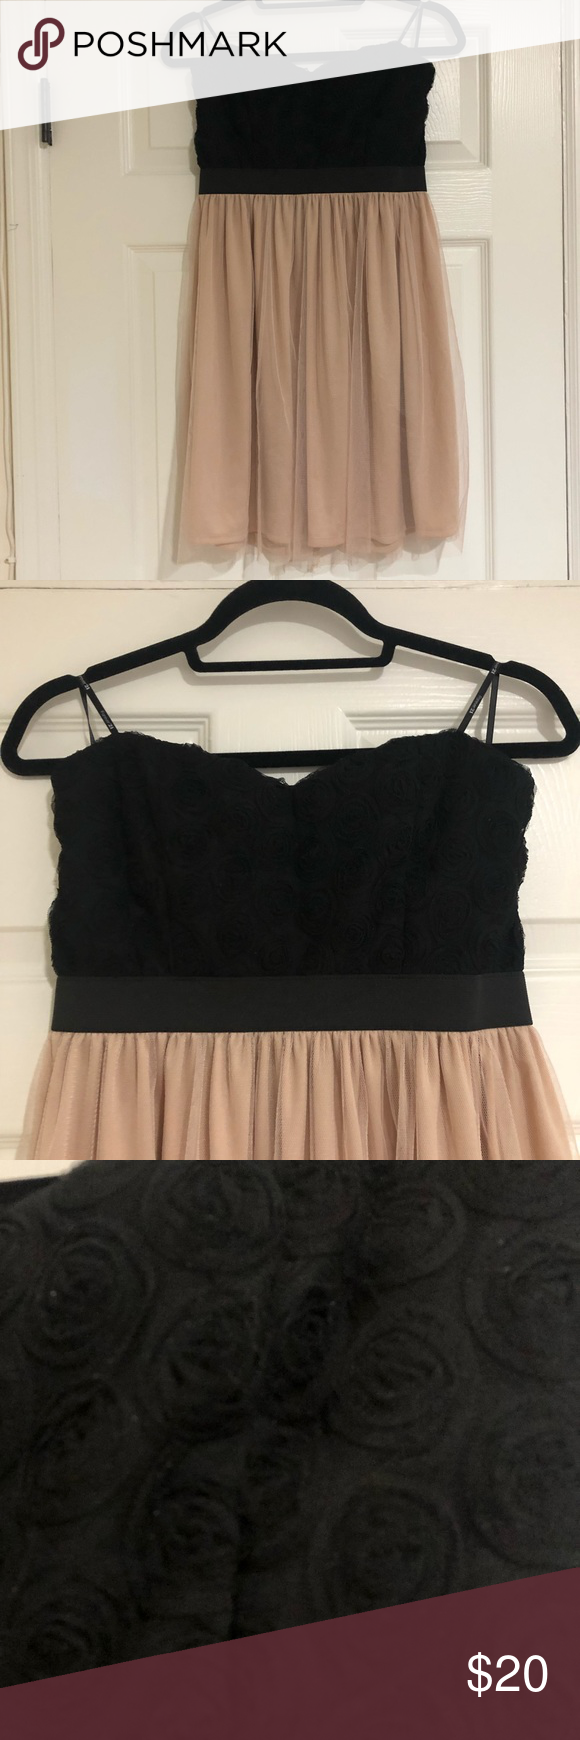 Black And Cream Strapless Dress Strapless Dress Dresses Two Piece Skirt Set [ 1740 x 580 Pixel ]